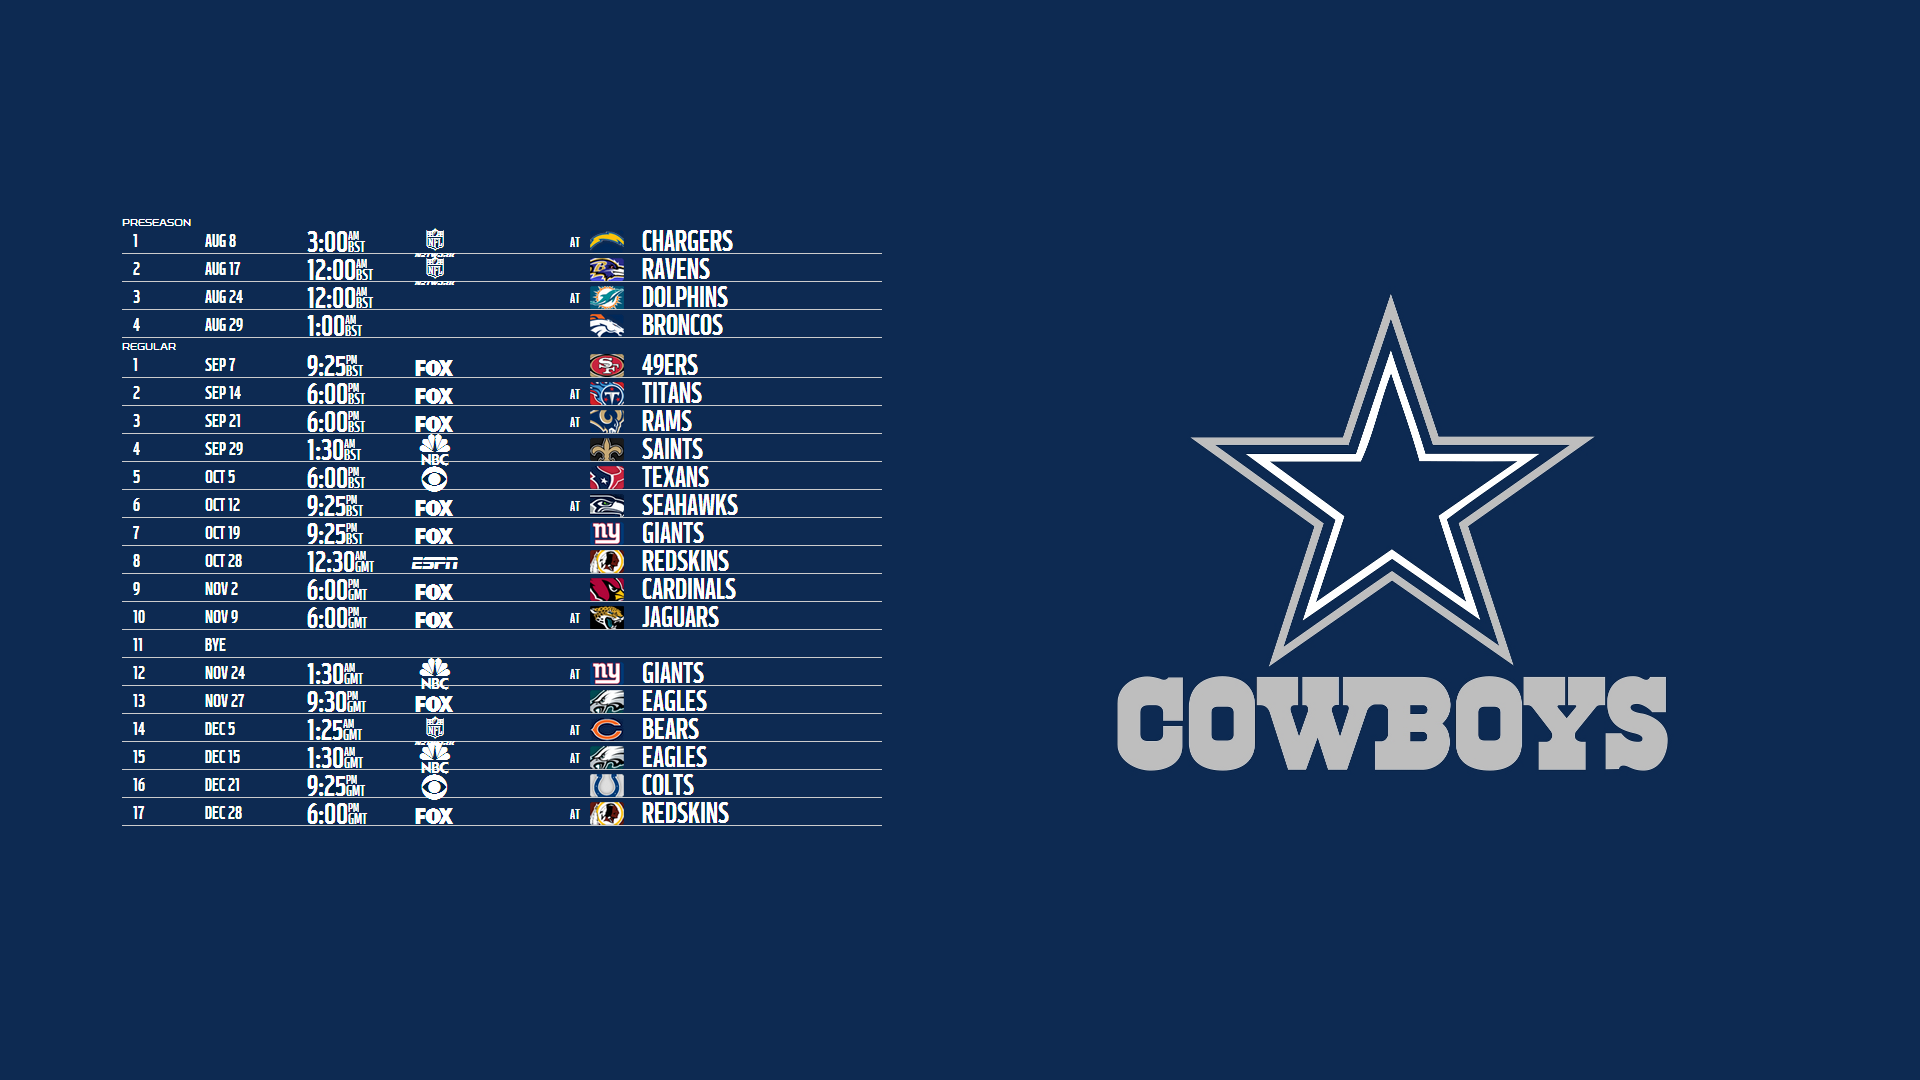 Dallas Cowboys Wallpapers Download 1920x1080